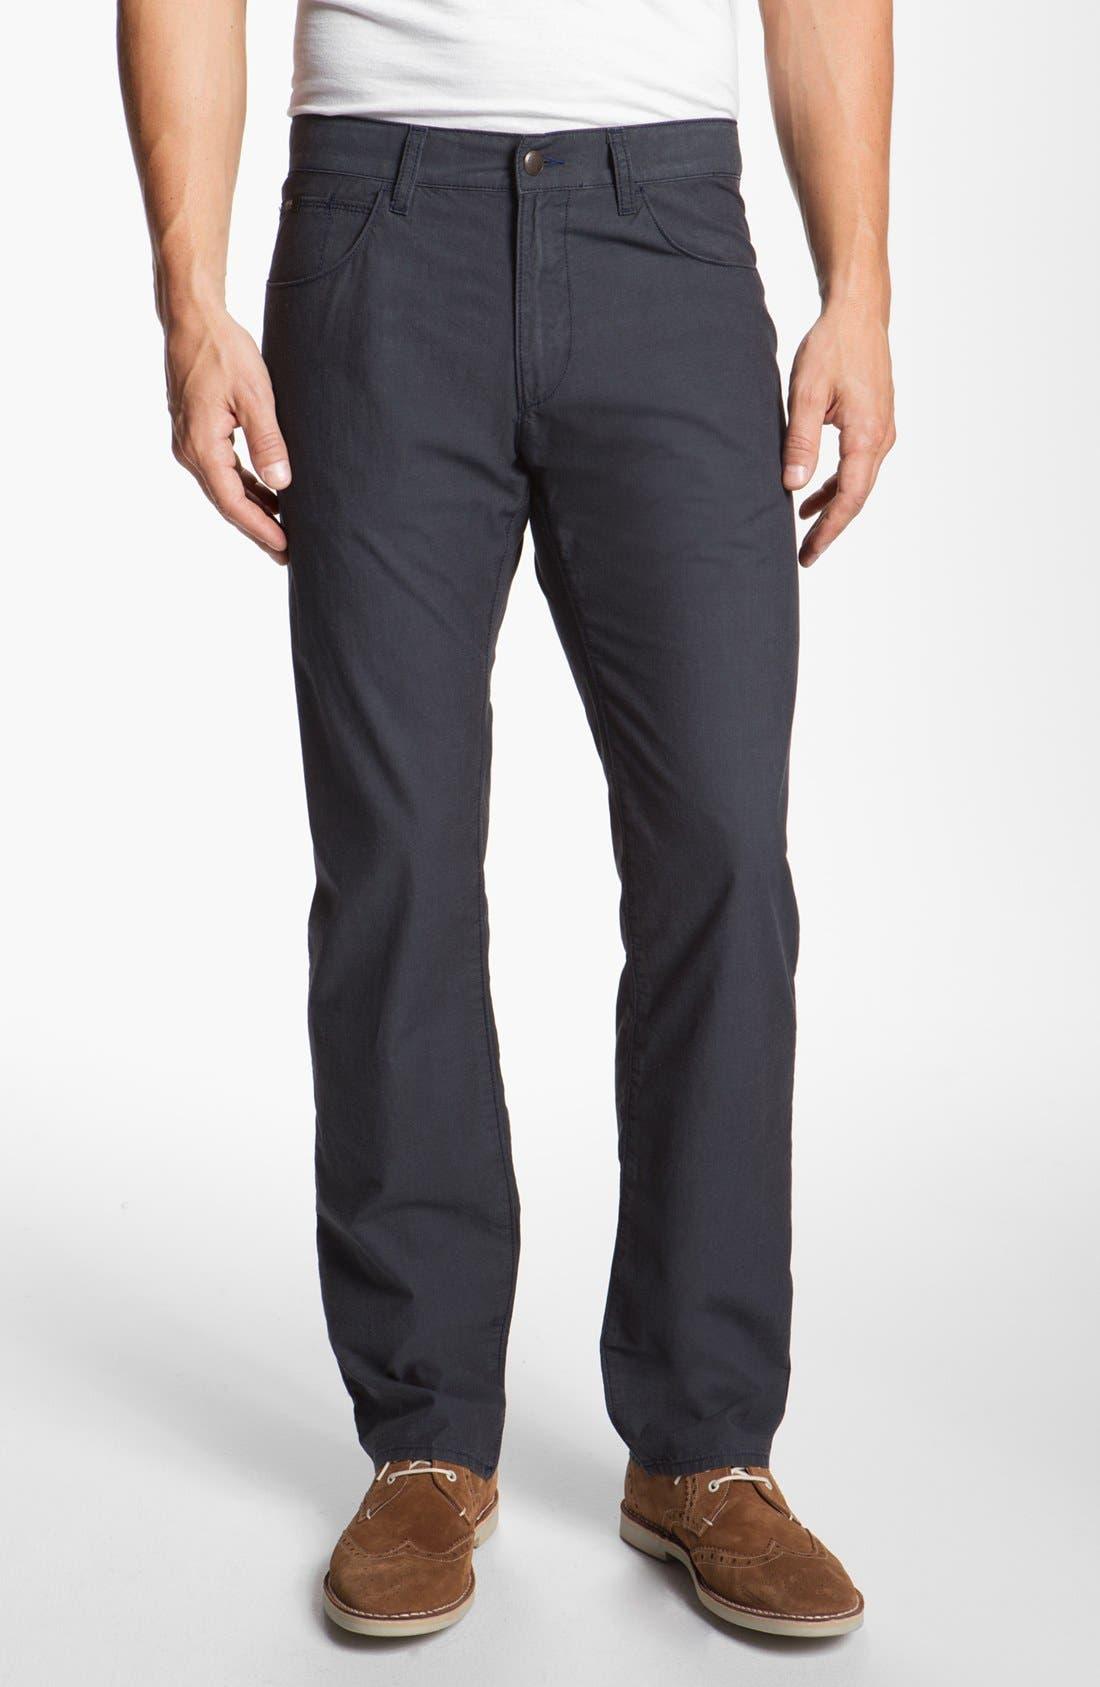 Alternate Image 1 Selected - BOSS HUGO BOSS 'Maine End on End' Five Pocket Pants